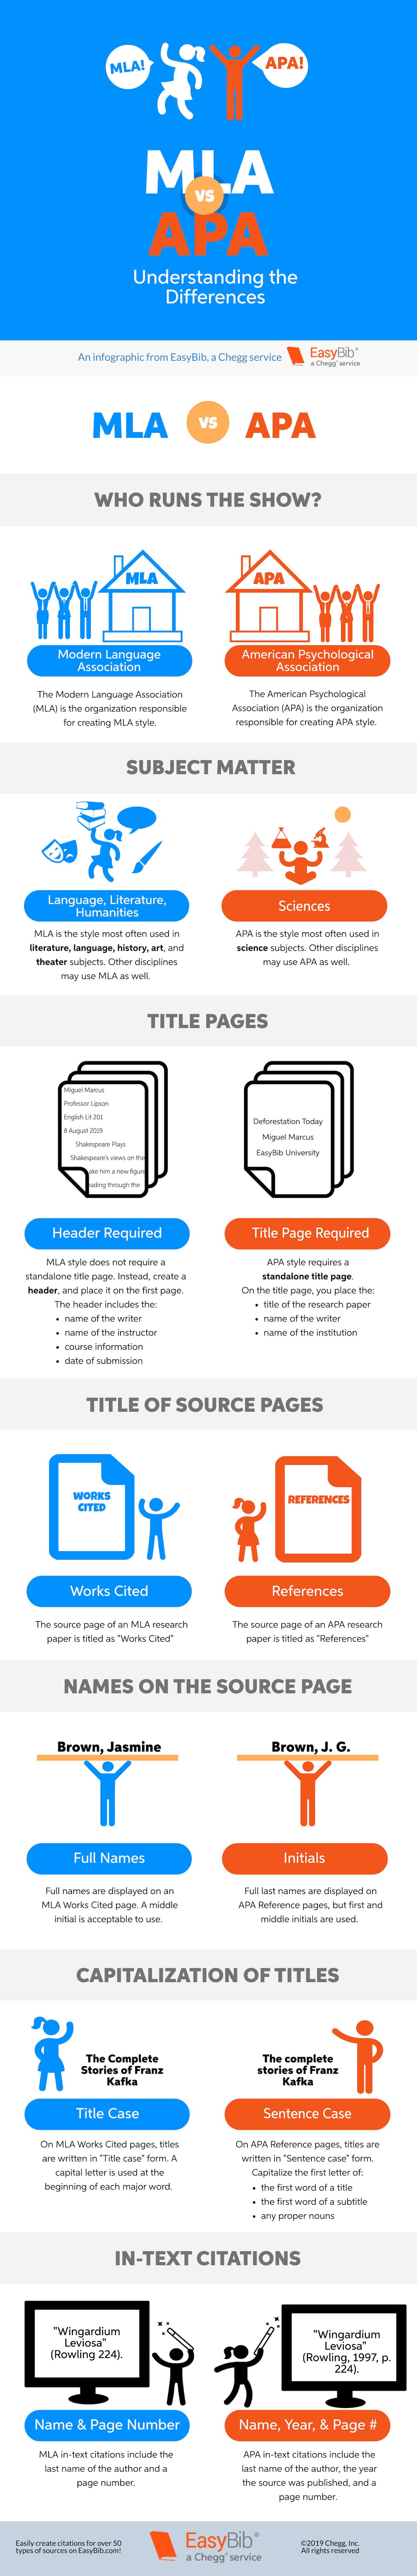 Mla Vs Apa Infographic Easybib Blog